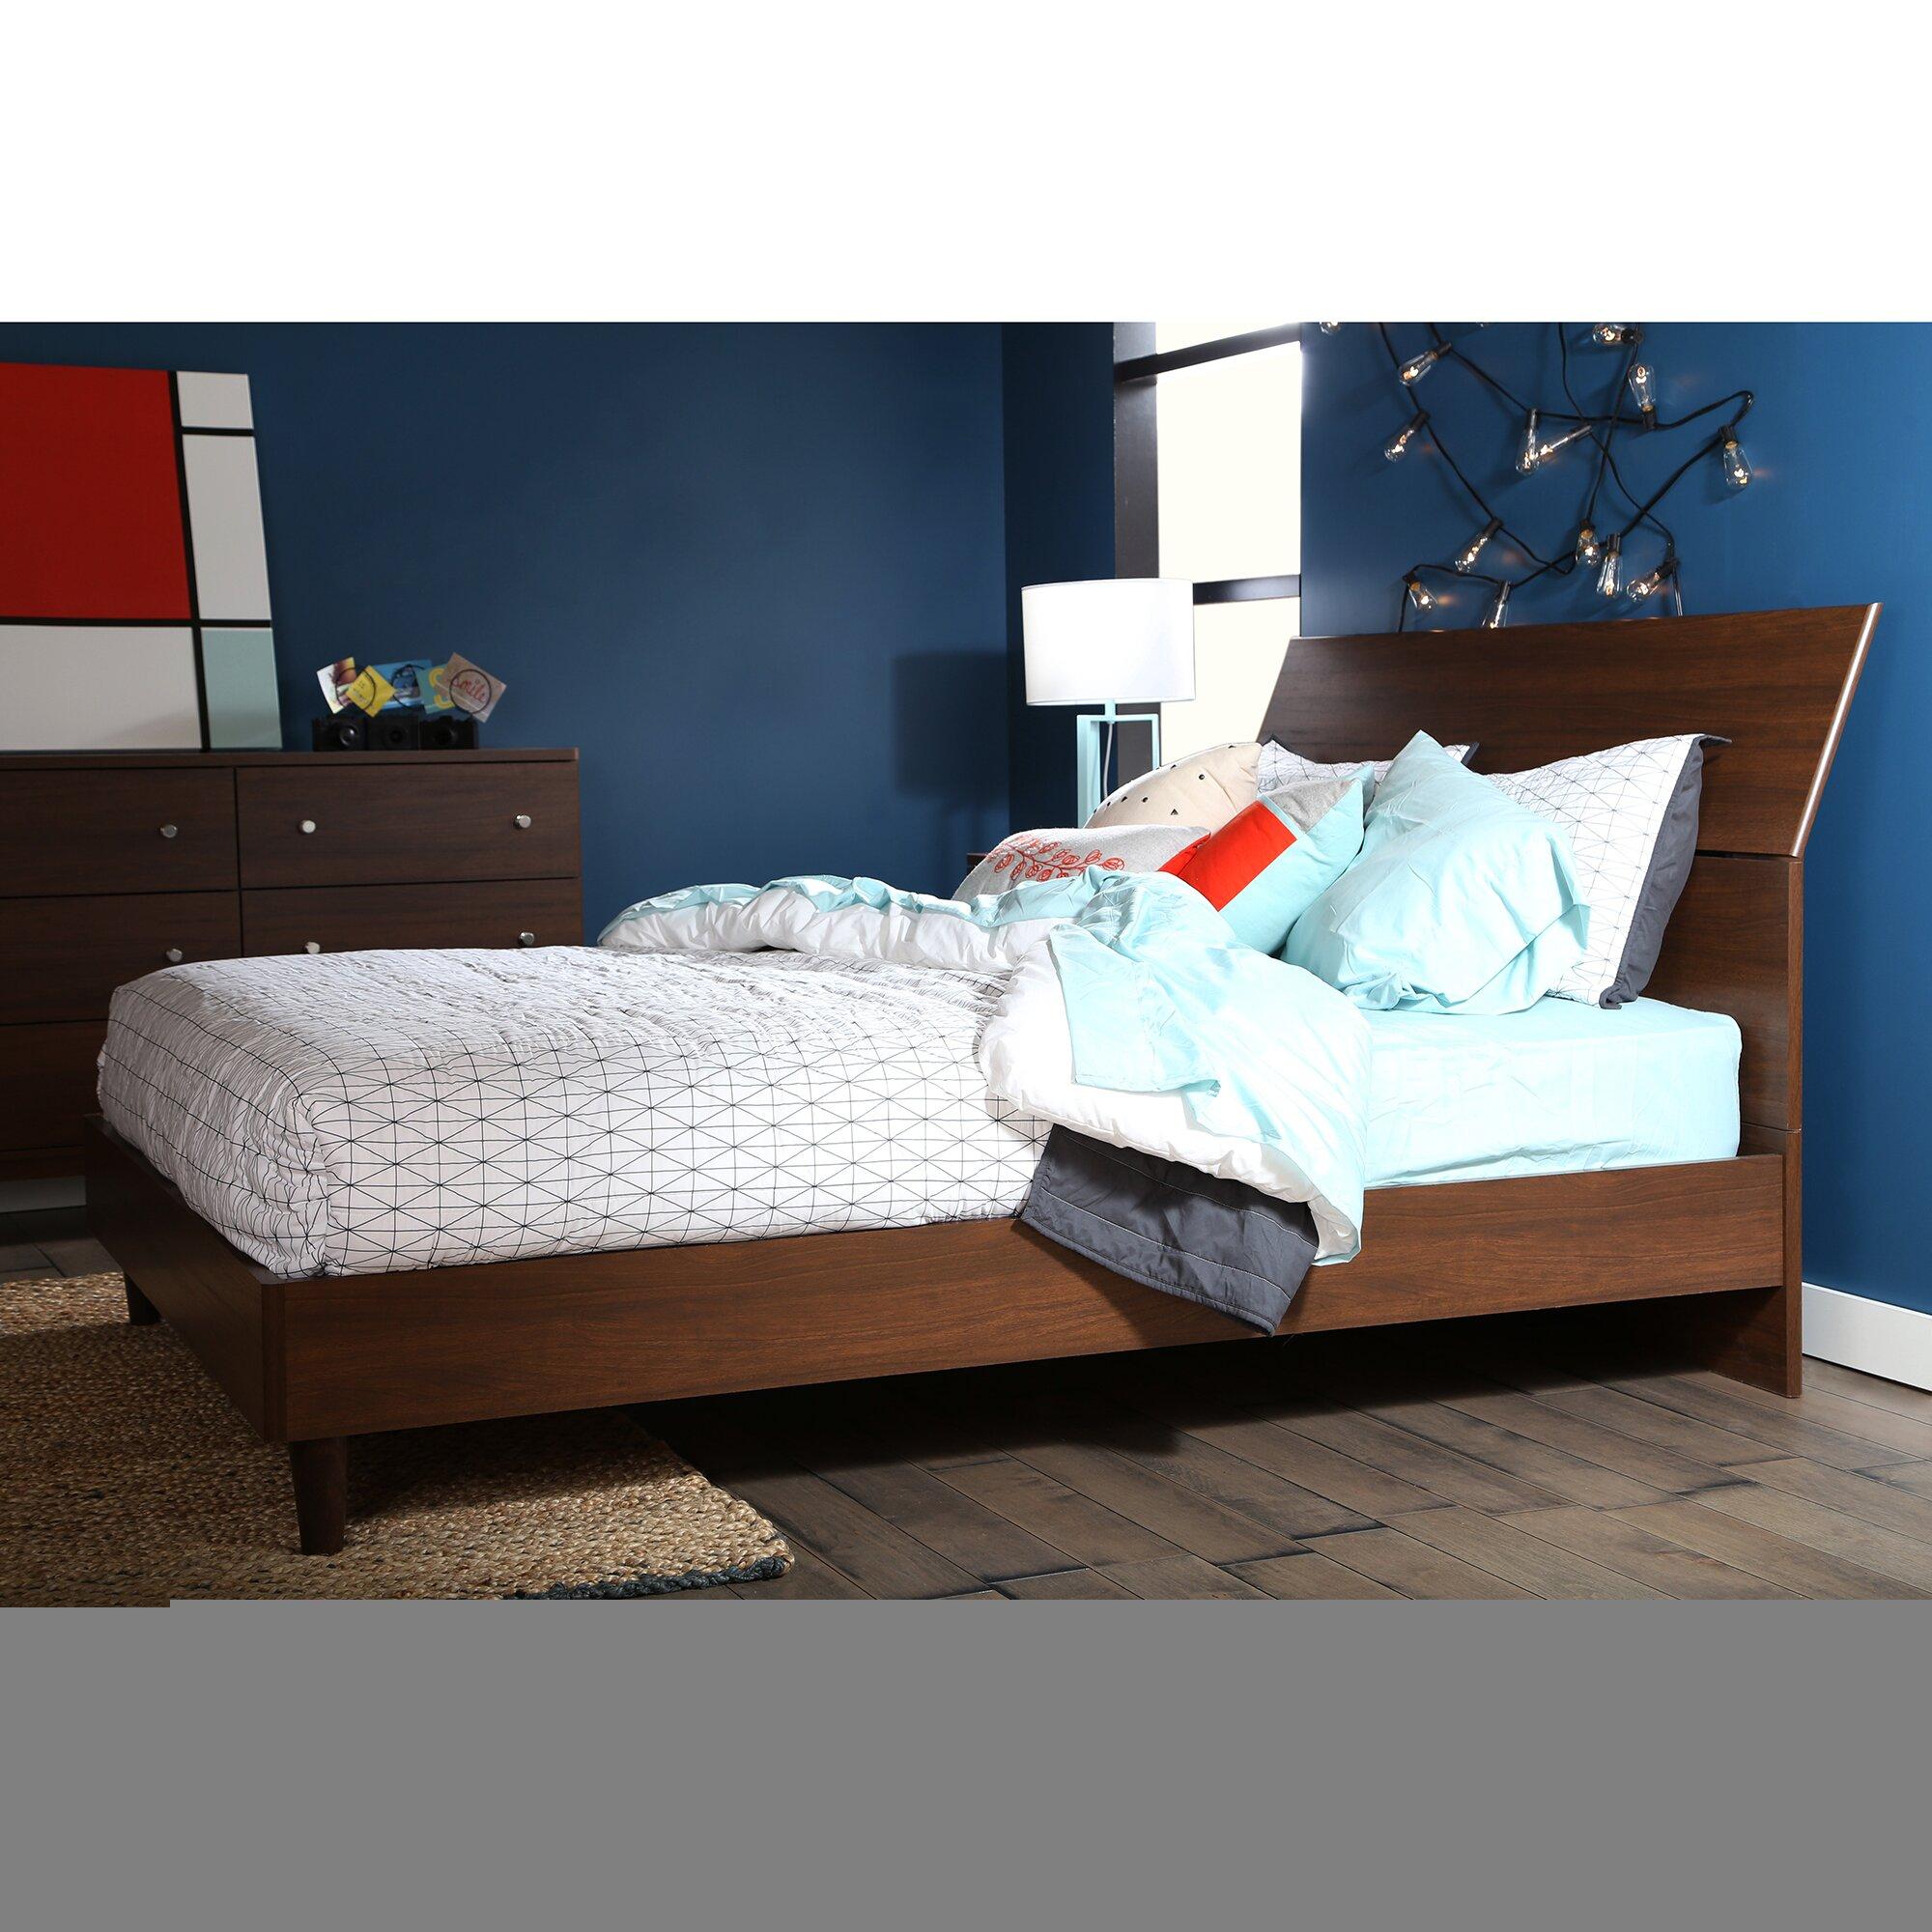 Modern Platform Bedroom Sets Soft Bedroom Lighting Black And Red Bedroom Interior Design Bedroom Furniture Ideas 2016: South Shore Olly Queen Platform Customizable Bedroom Set